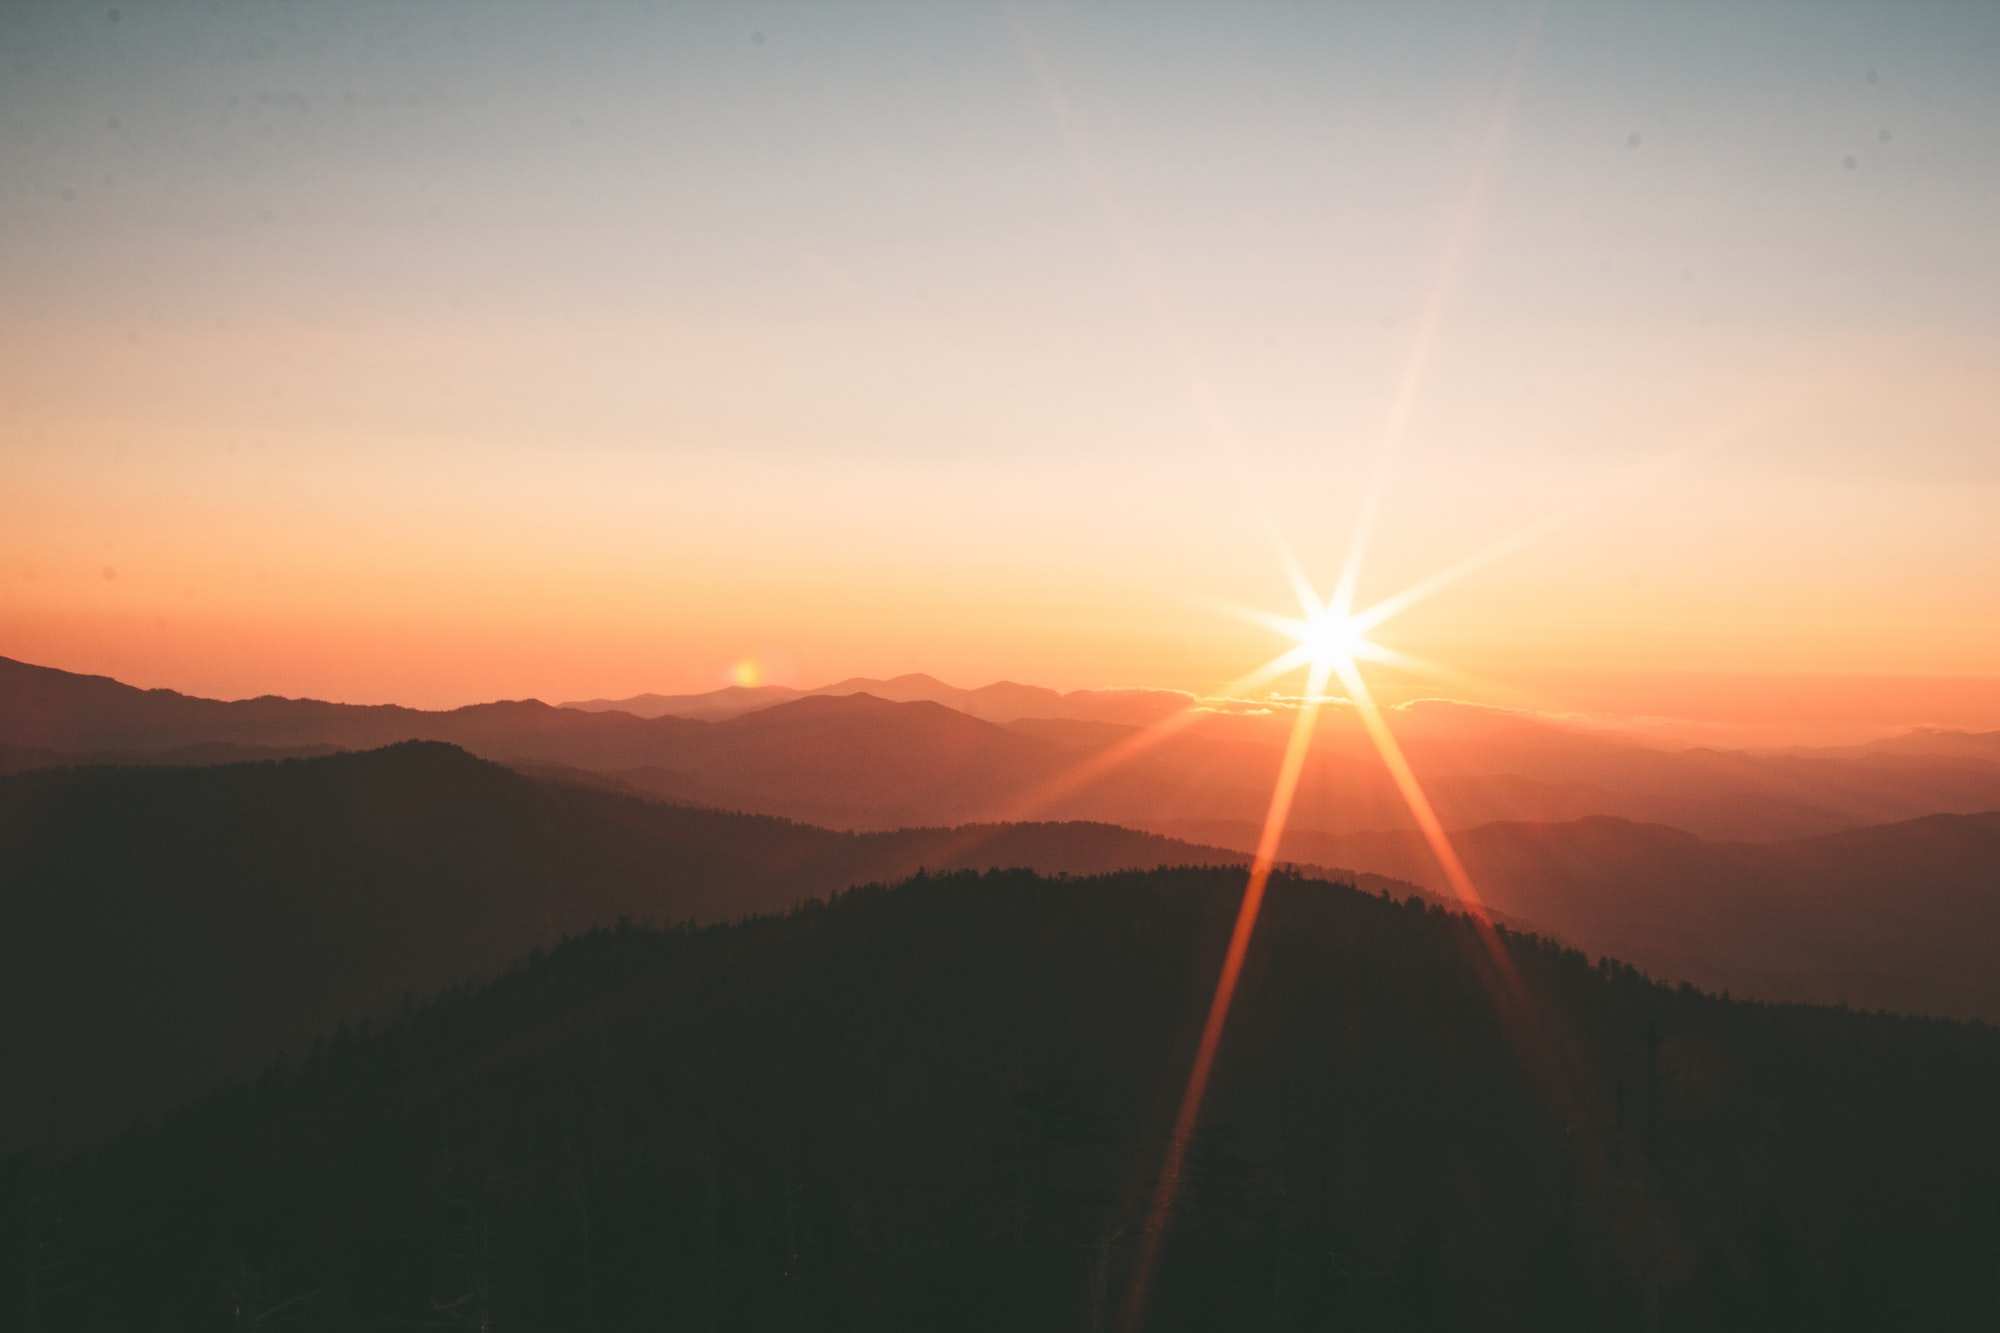 Gratitude Stories: Attitude of Gratitude